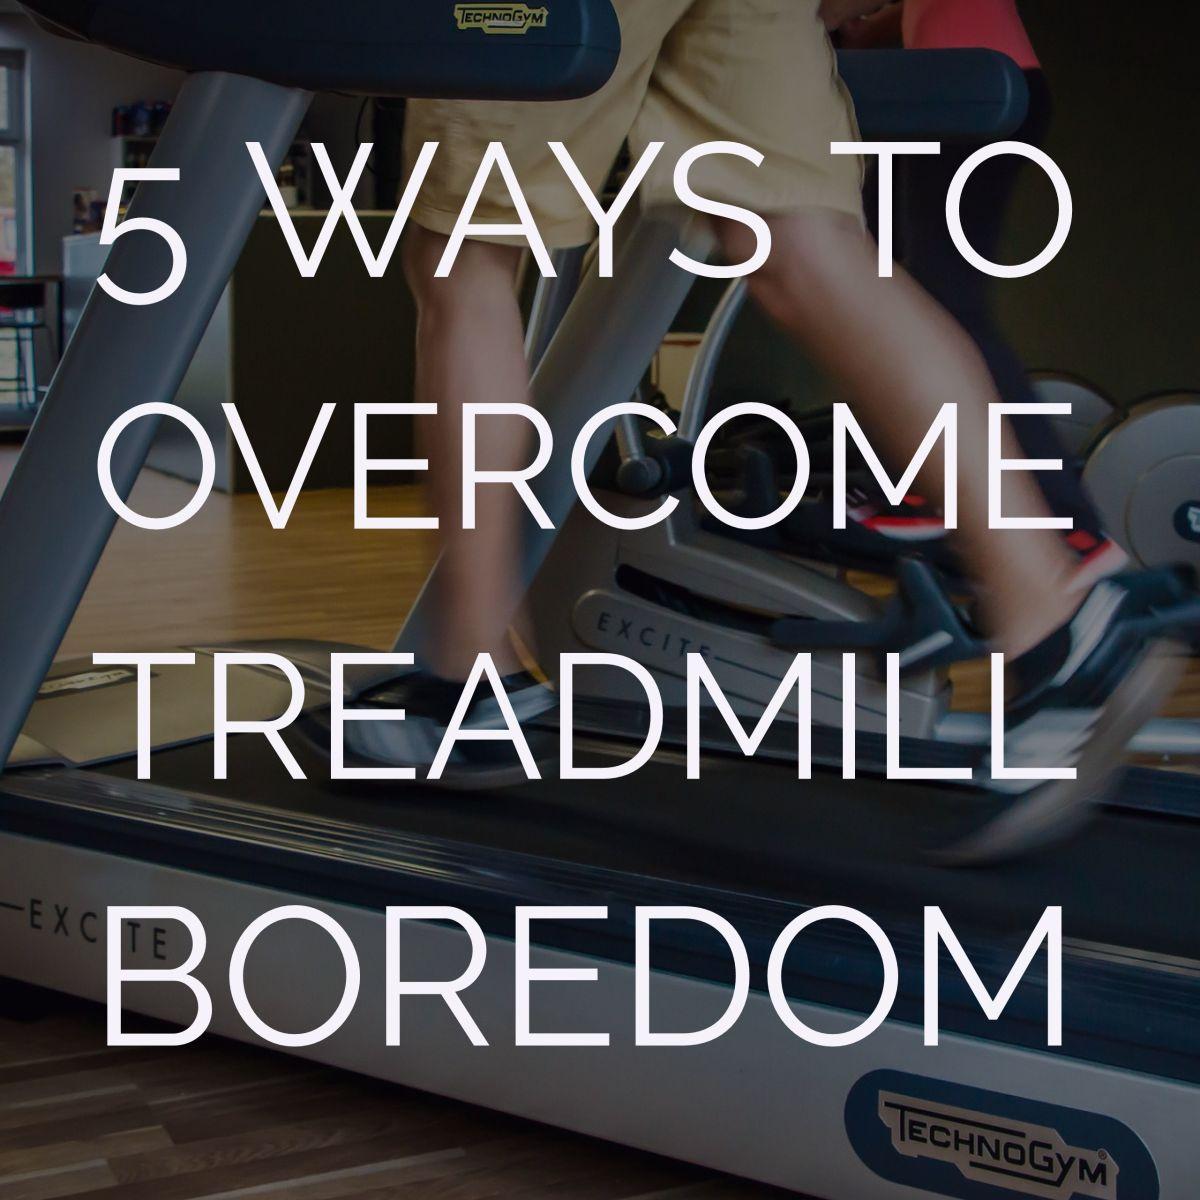 4-ways-to-overcome-treadmill-boredom